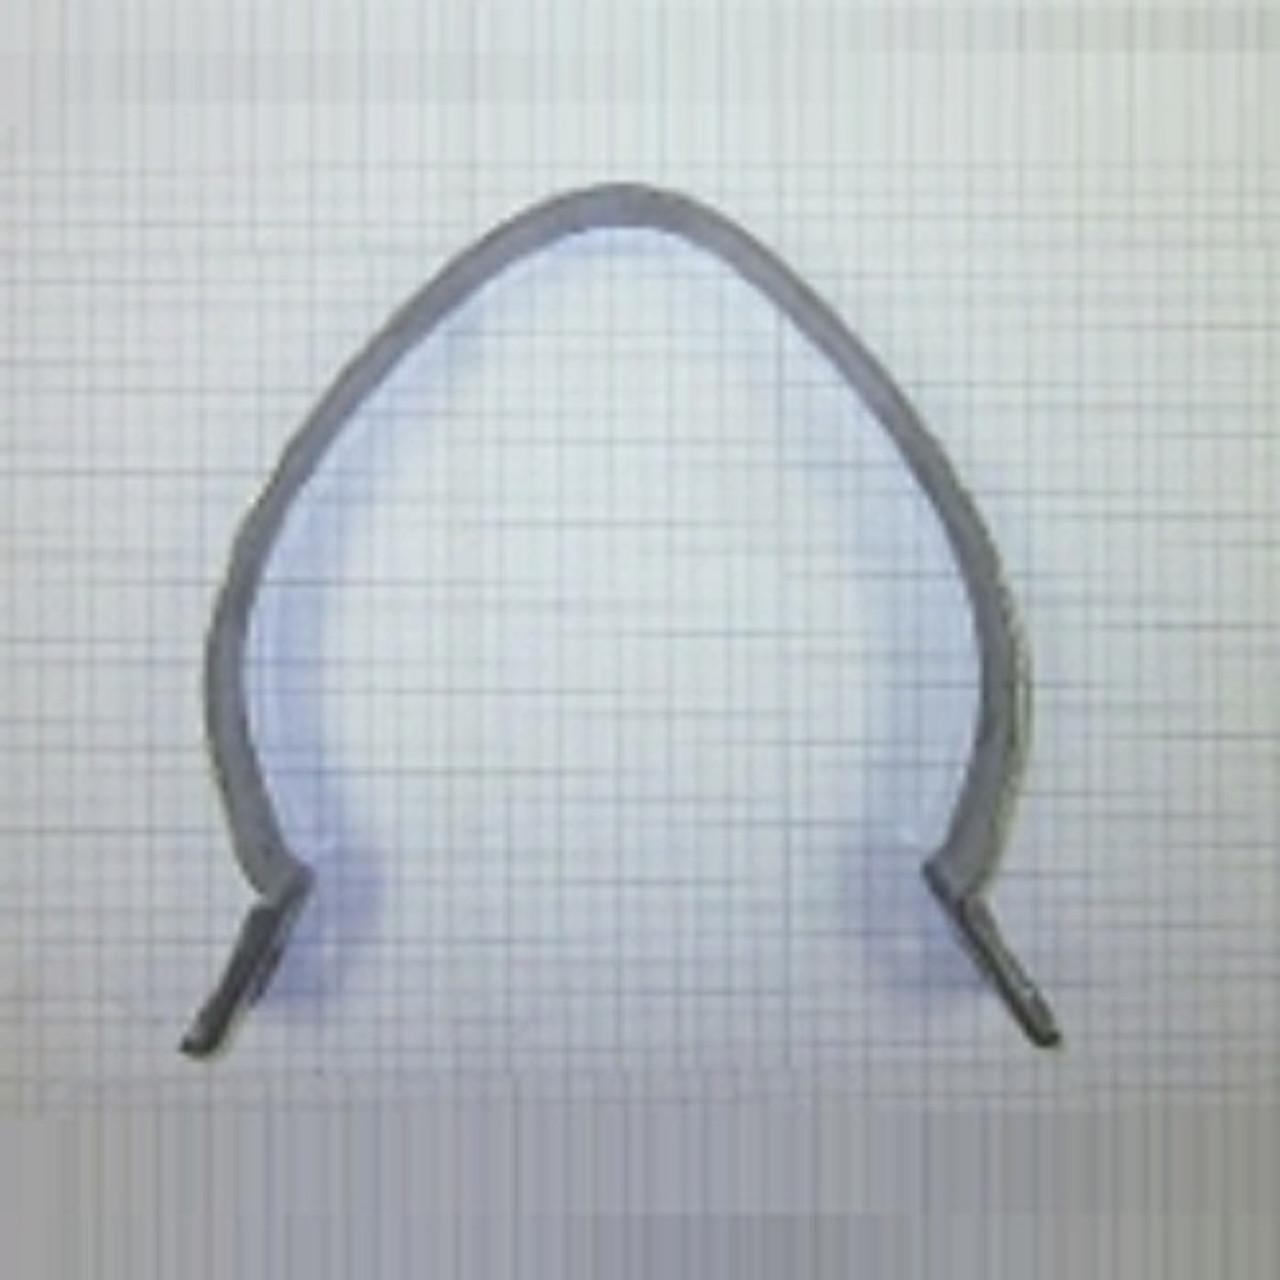 EMBRACE HOOP (MUFFLER COMP.EX) for TrailMaster 150 XRS, 150 XRX